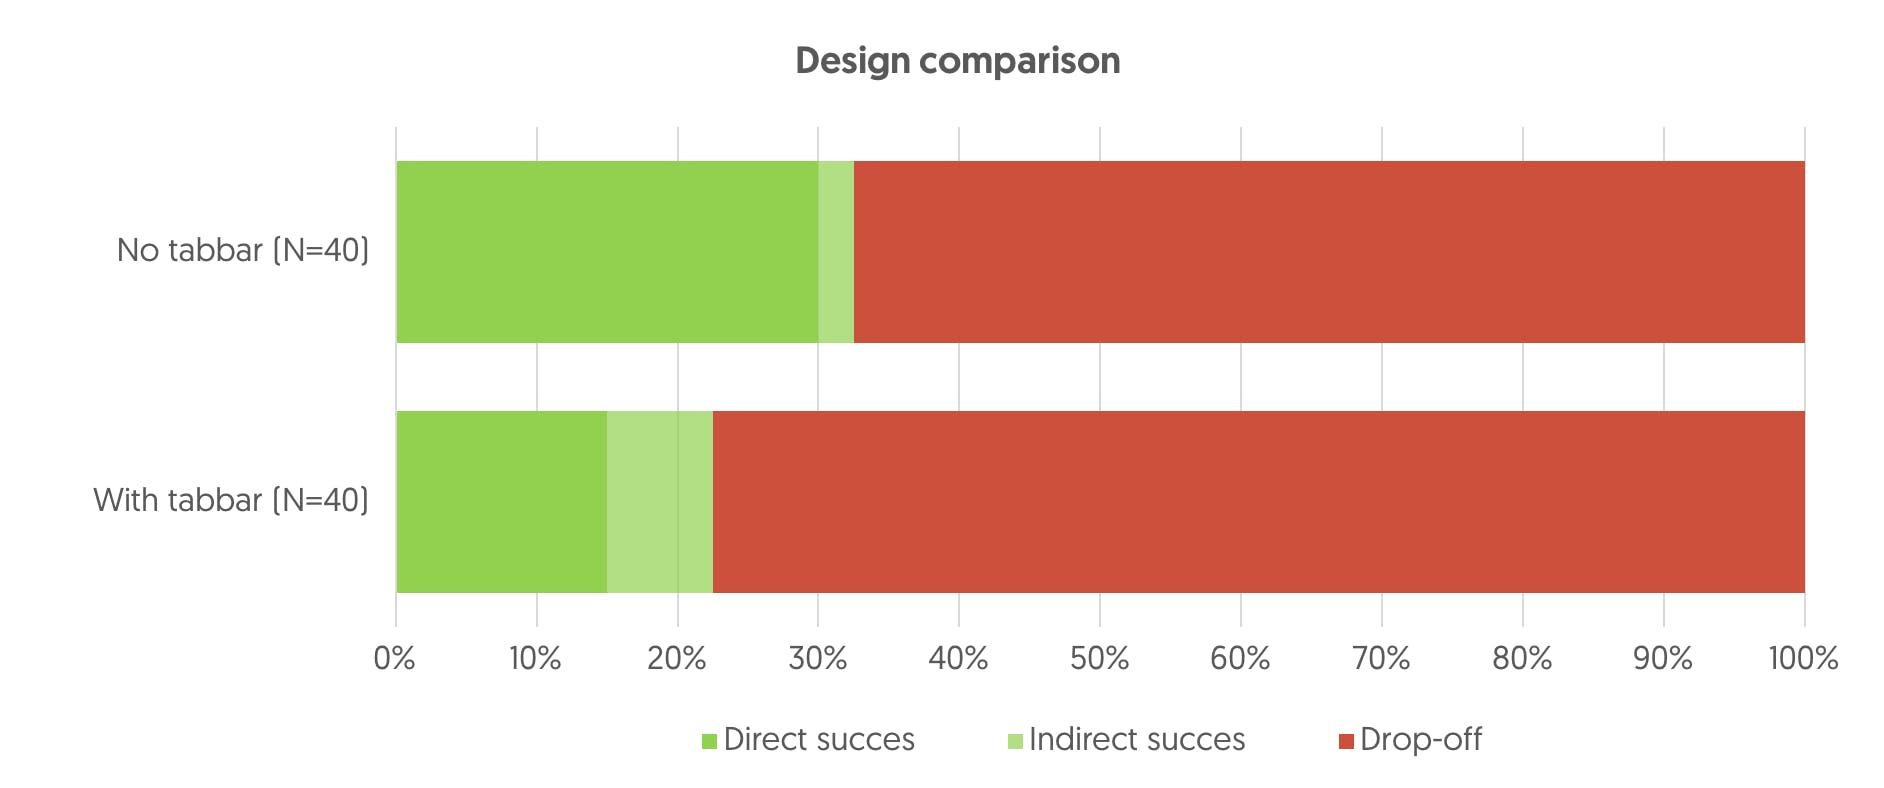 AB testing design results